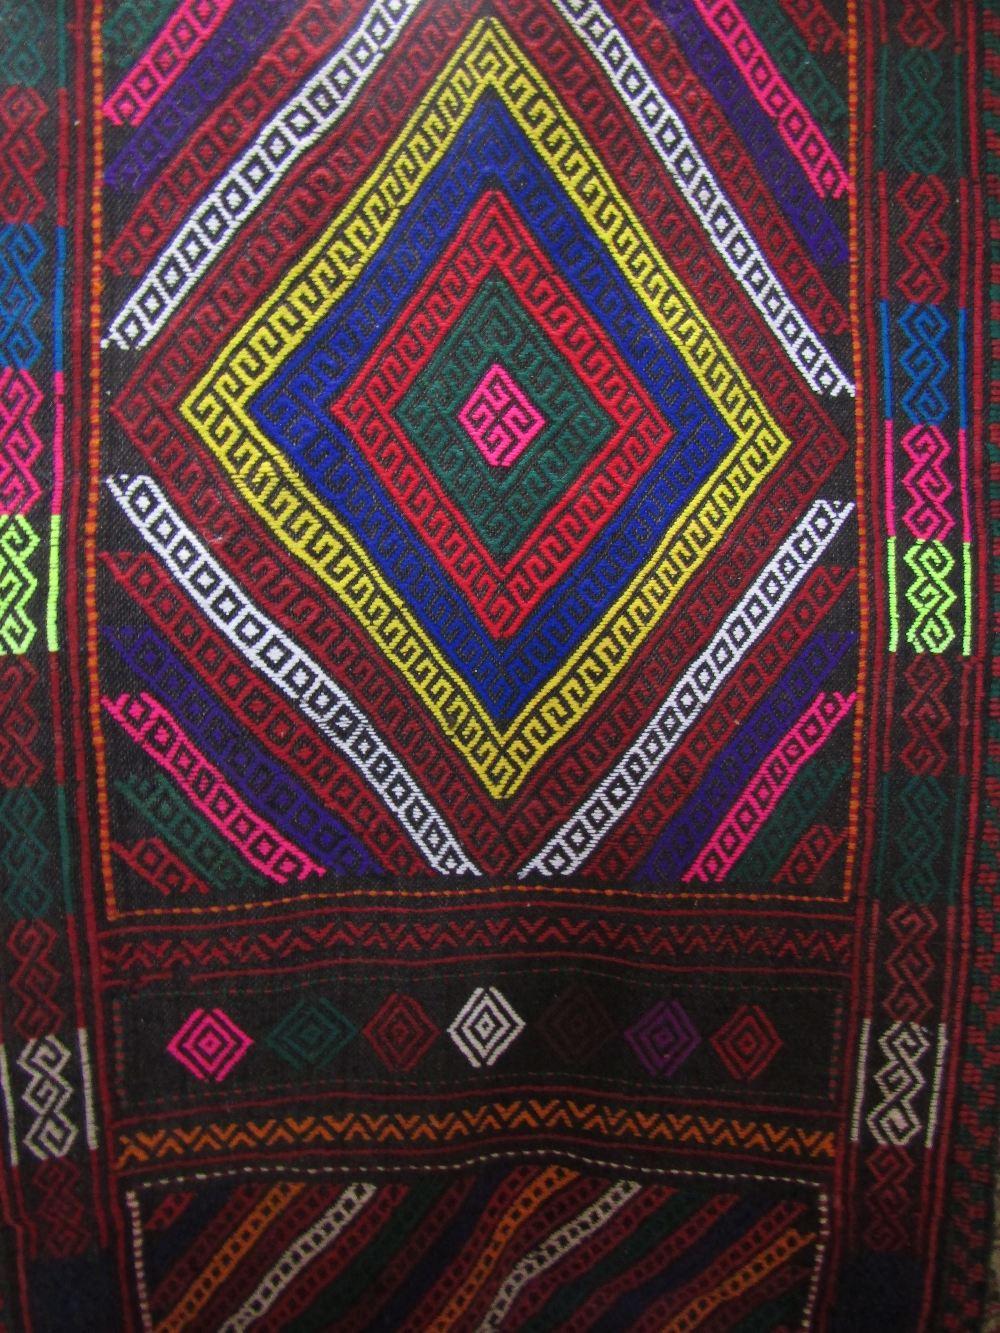 Lot 1423 - Gazak rug with geometric decoration upon a navy blue ground, 120 x 115cm